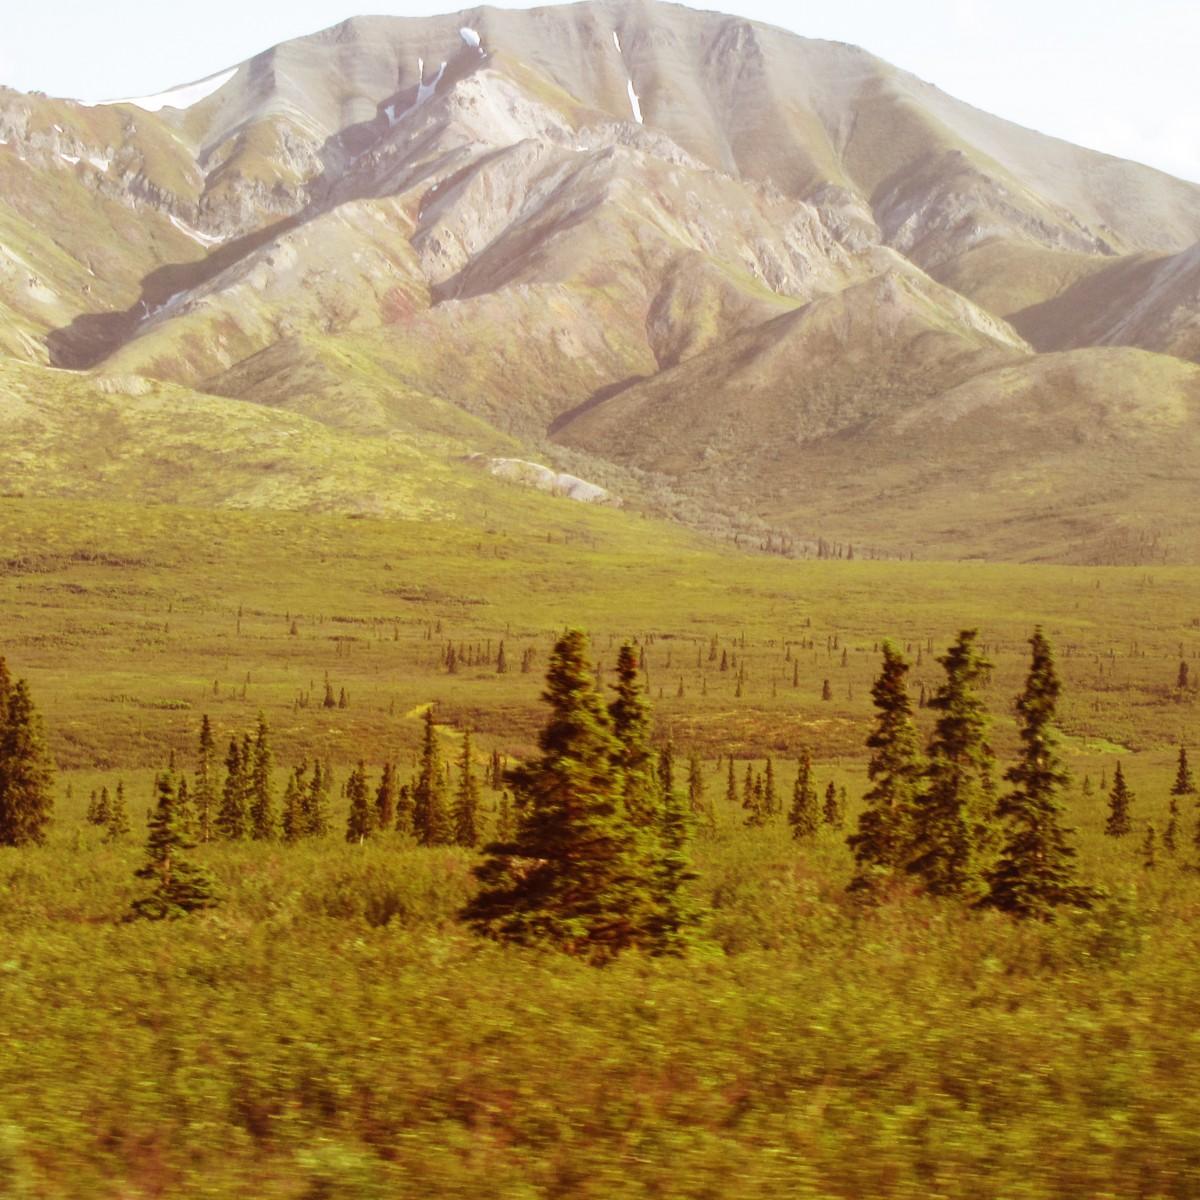 Zdjęcia: Alaska, Alaska, Denali, USA